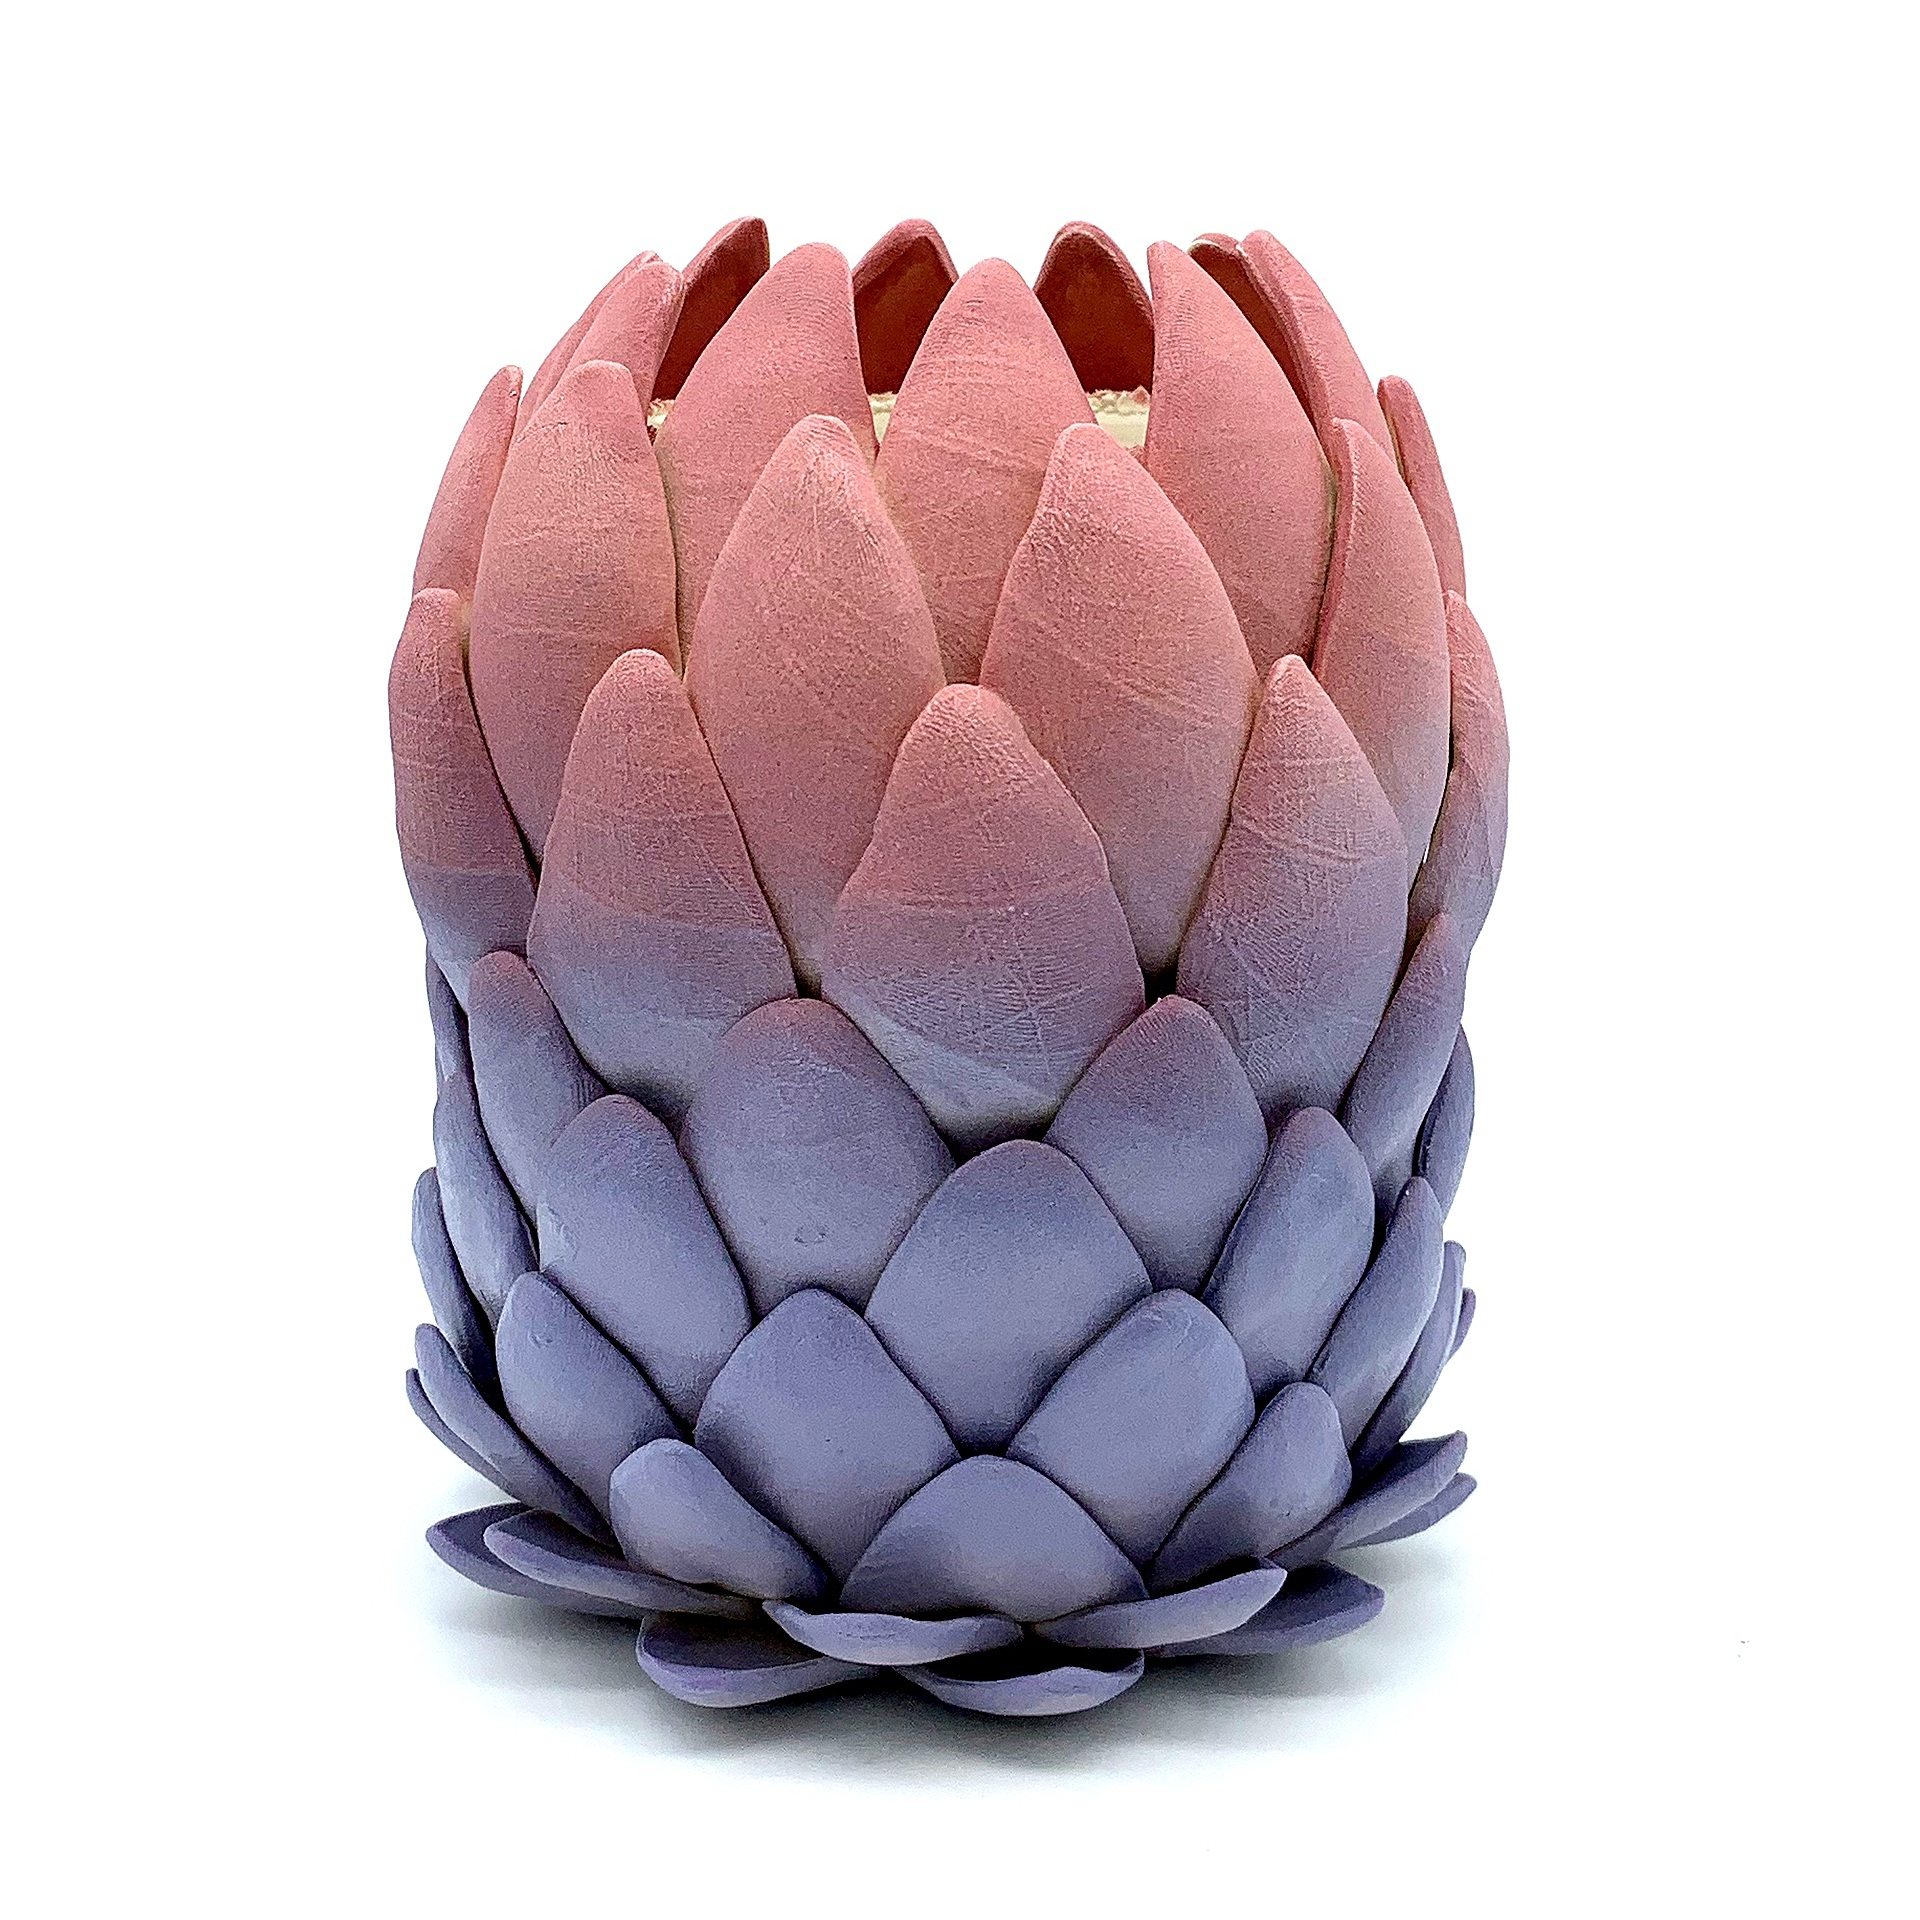 "Mink Protea Hybrid - 7""x4.5""x4.5""Porcelain, Underglaze, Glaze, FlockingCone 5 Oxidation2019"